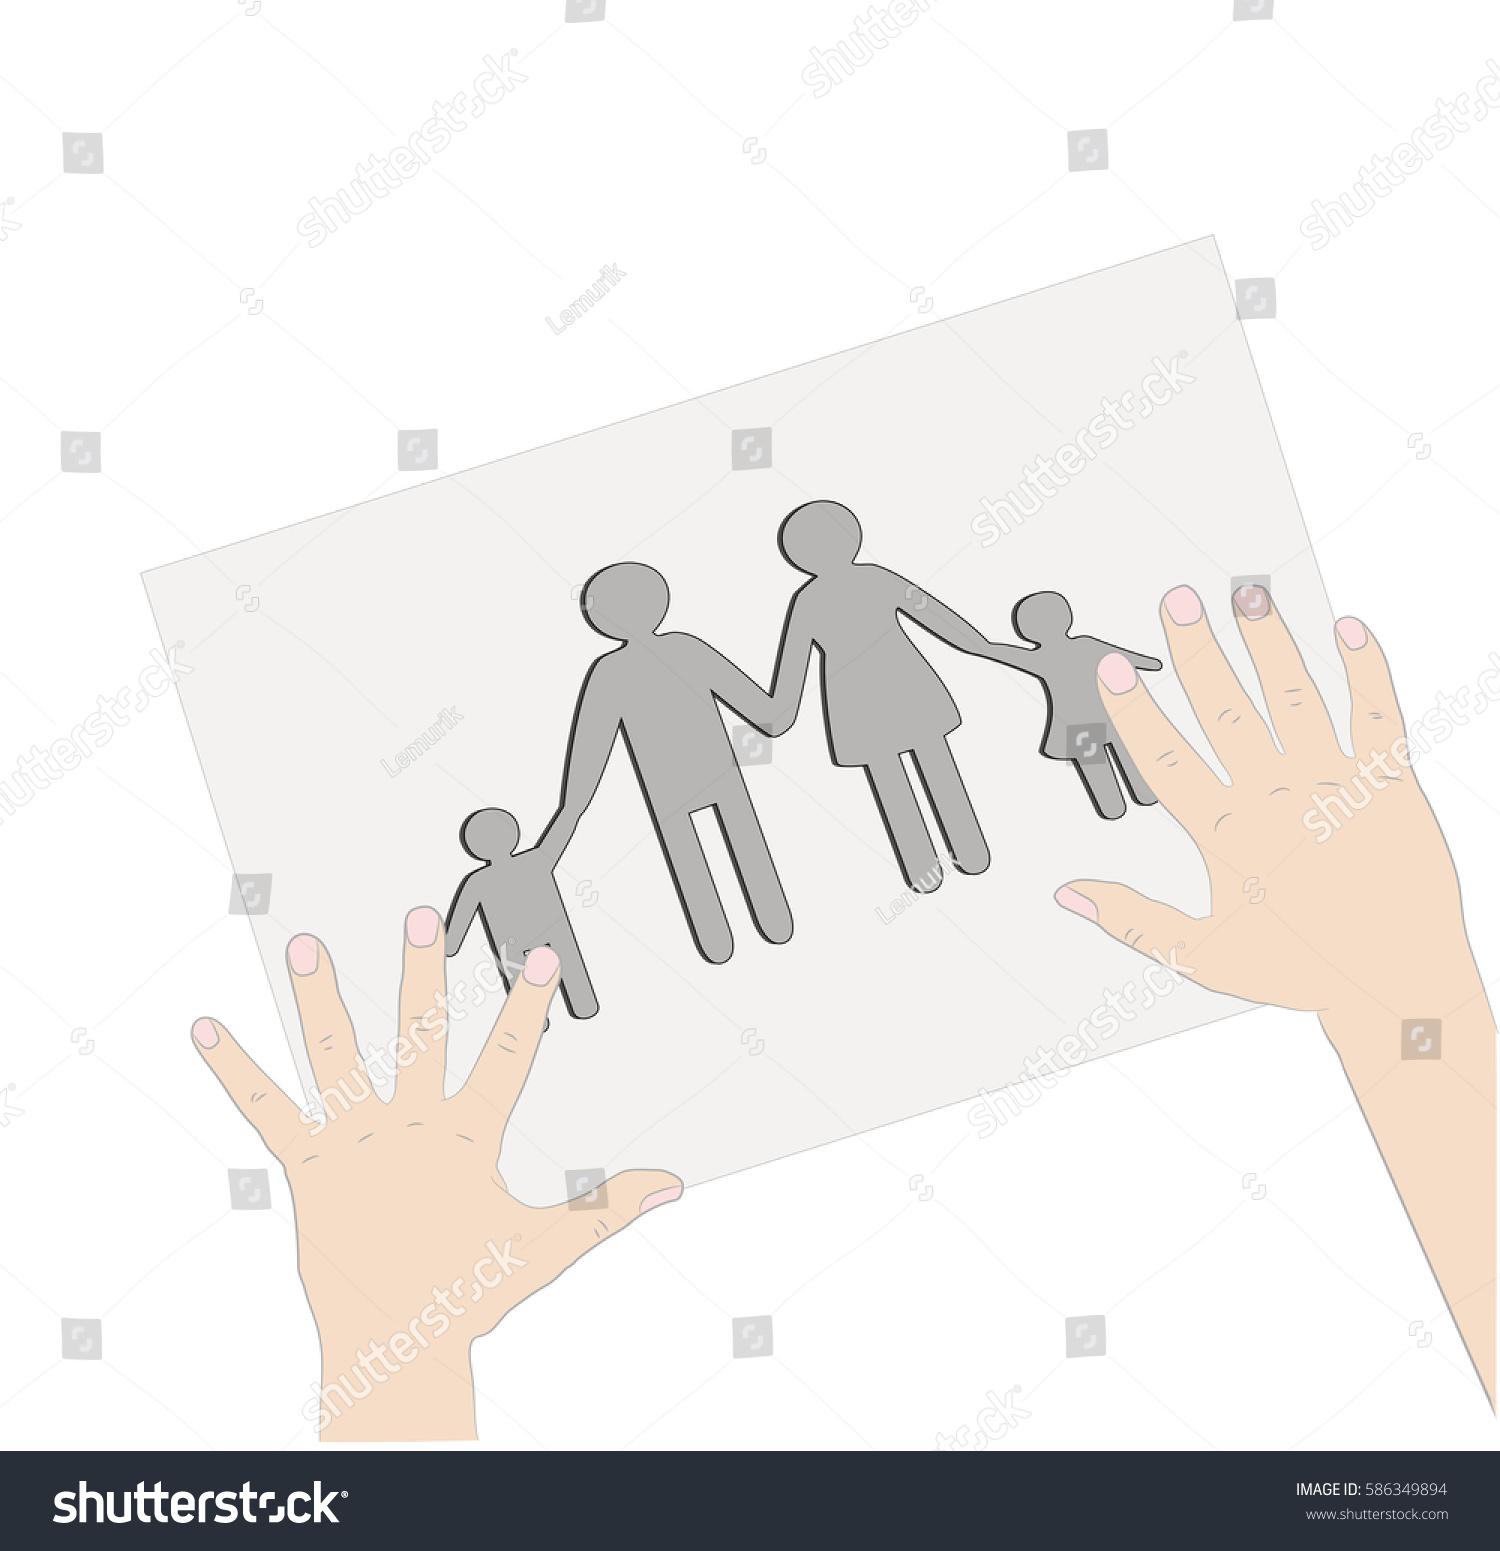 example illustration essay on parents